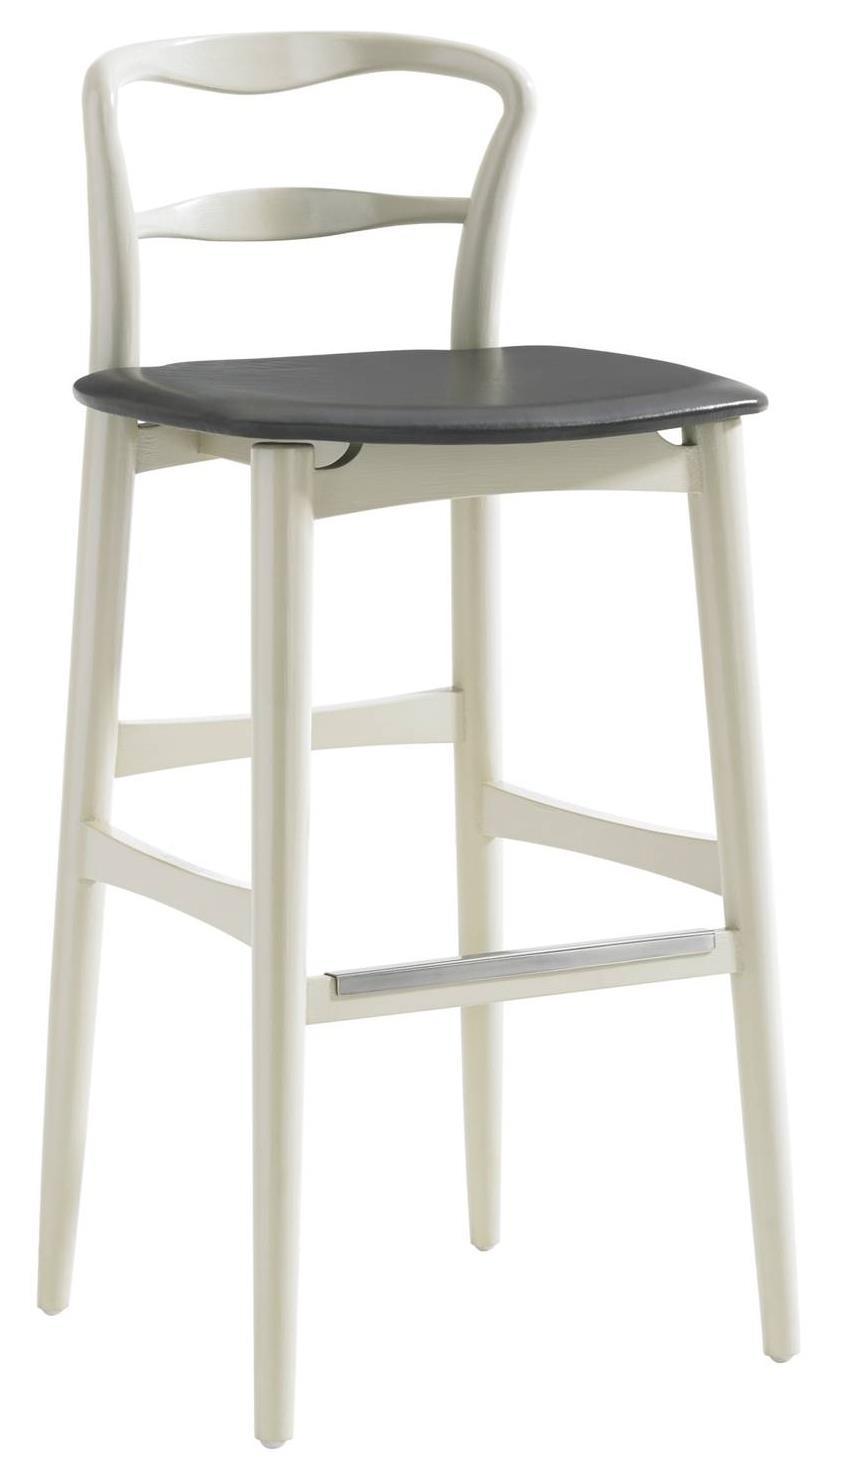 Stanley Furniture Crestaire Hooper Bar Stool - Item Number: 436-21-73